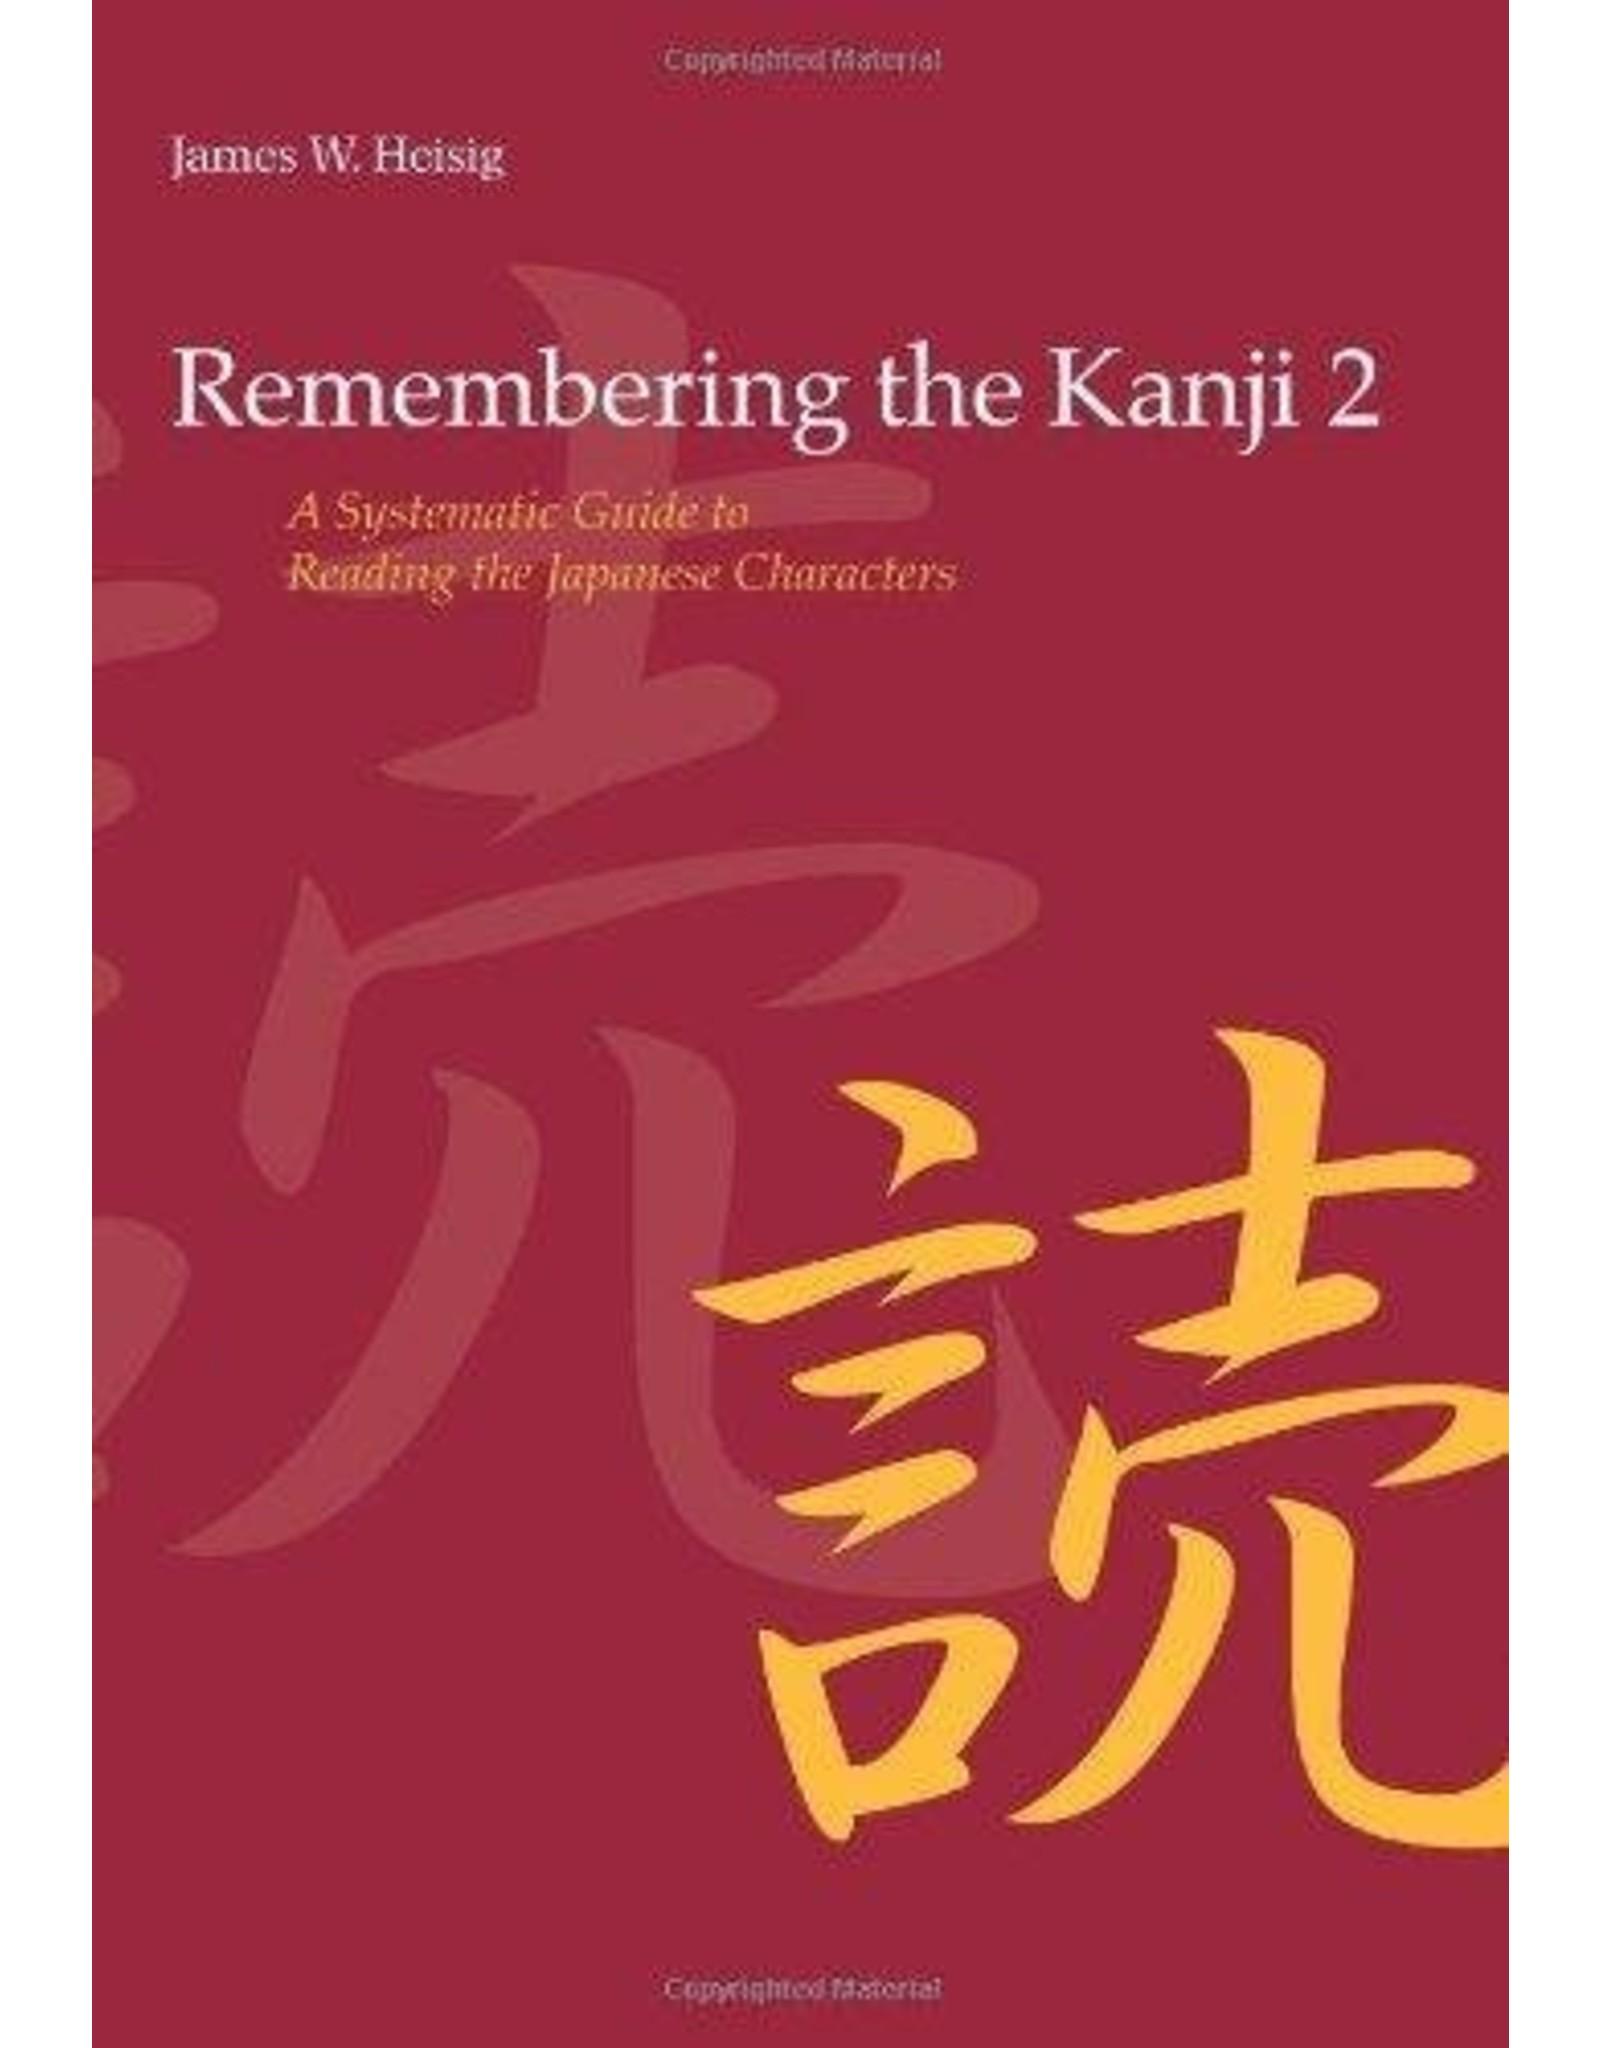 REMEMBERING THE KANJI (2)